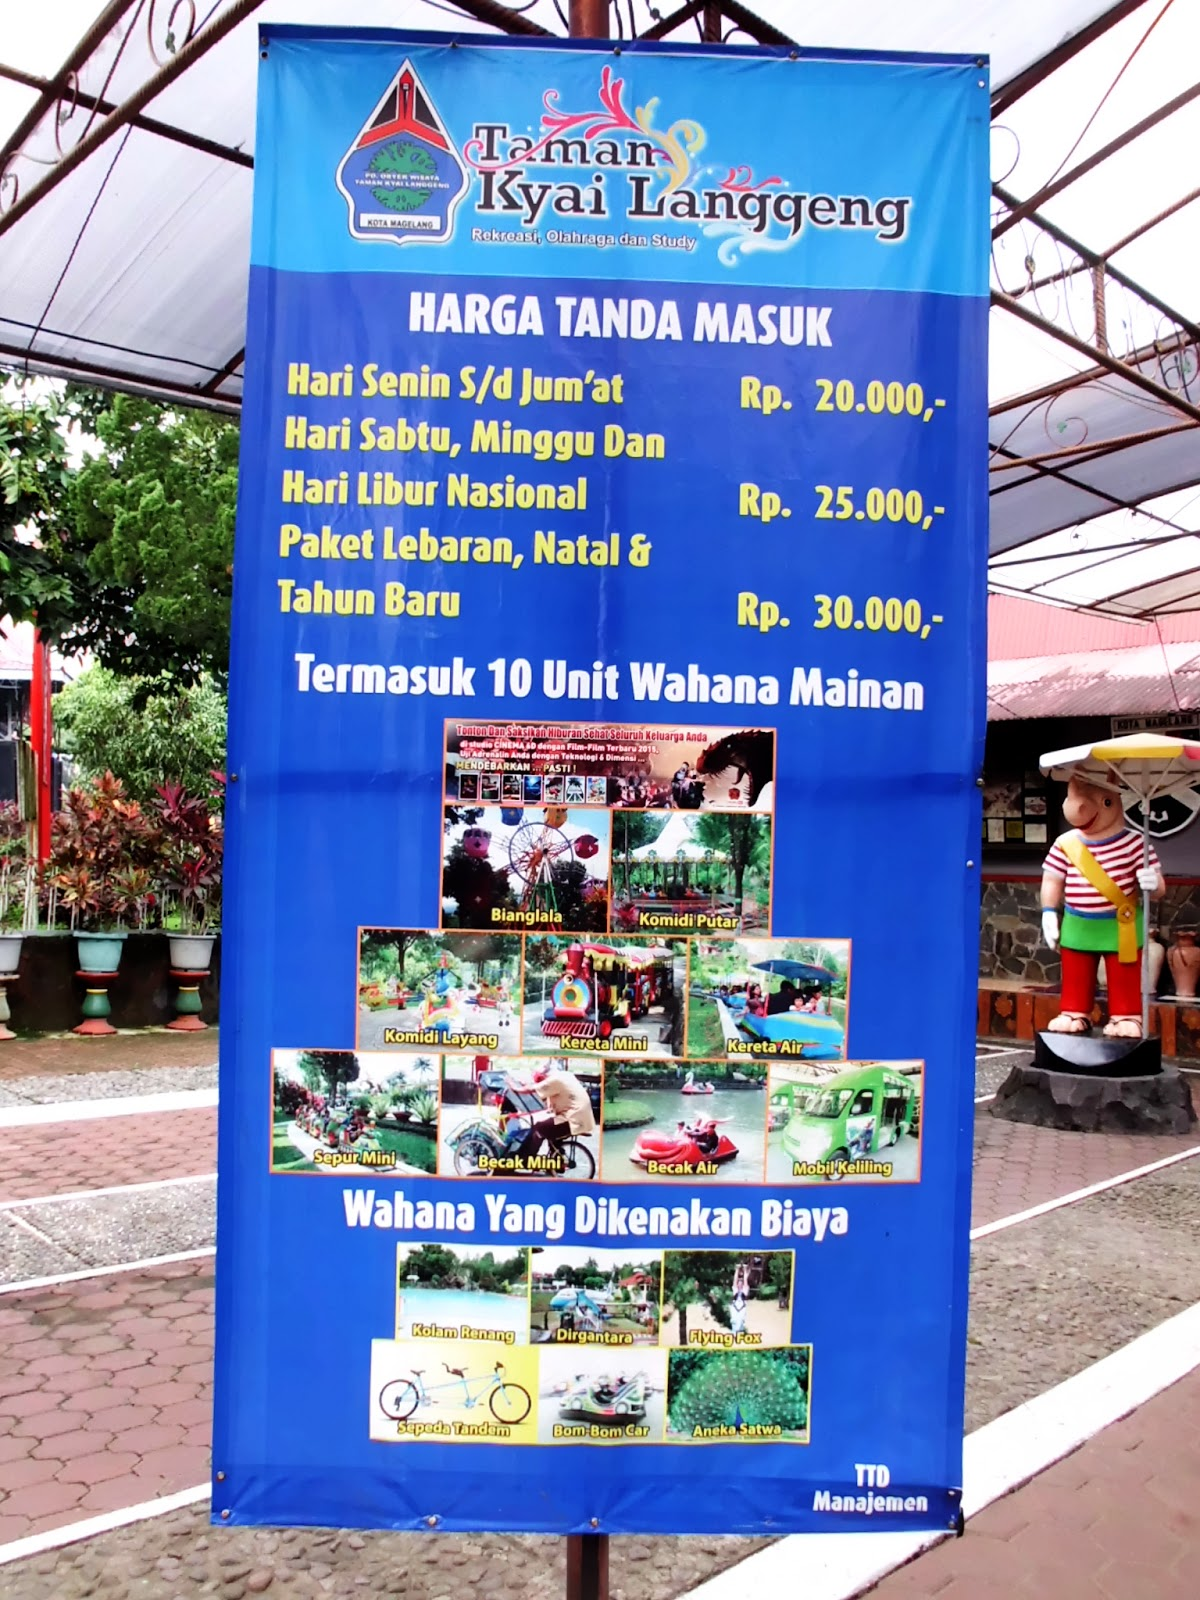 NglayapCah : Taman Kyai Langgeng Magelang